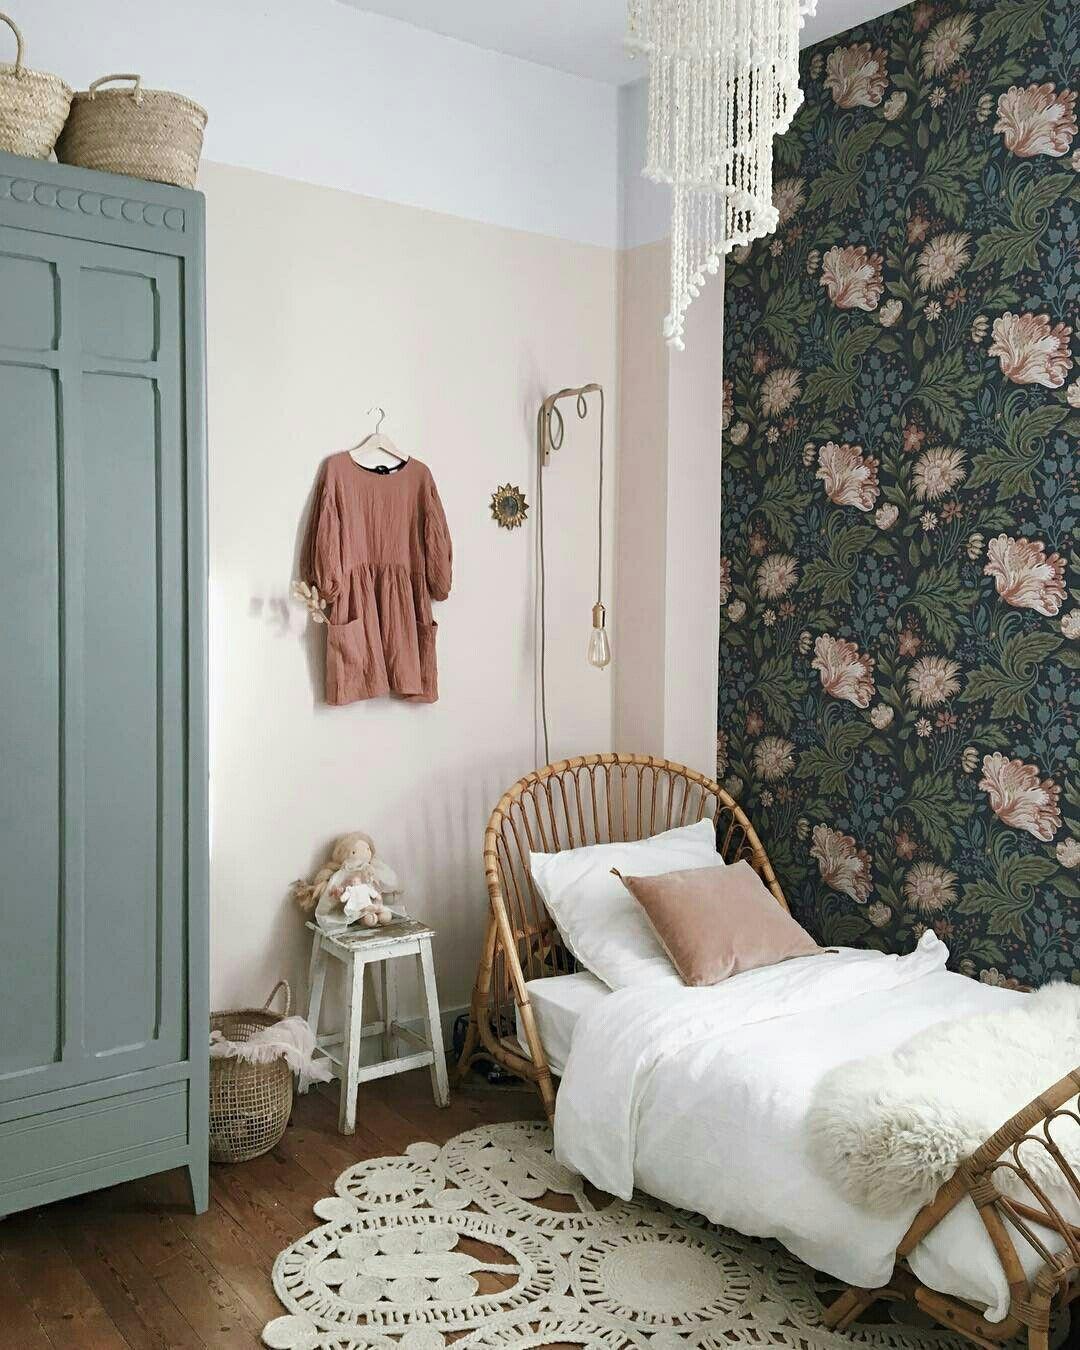 Mooi behang!! - vakantiehuis   Pinterest - Kinderkamer, Slaapkamer ...